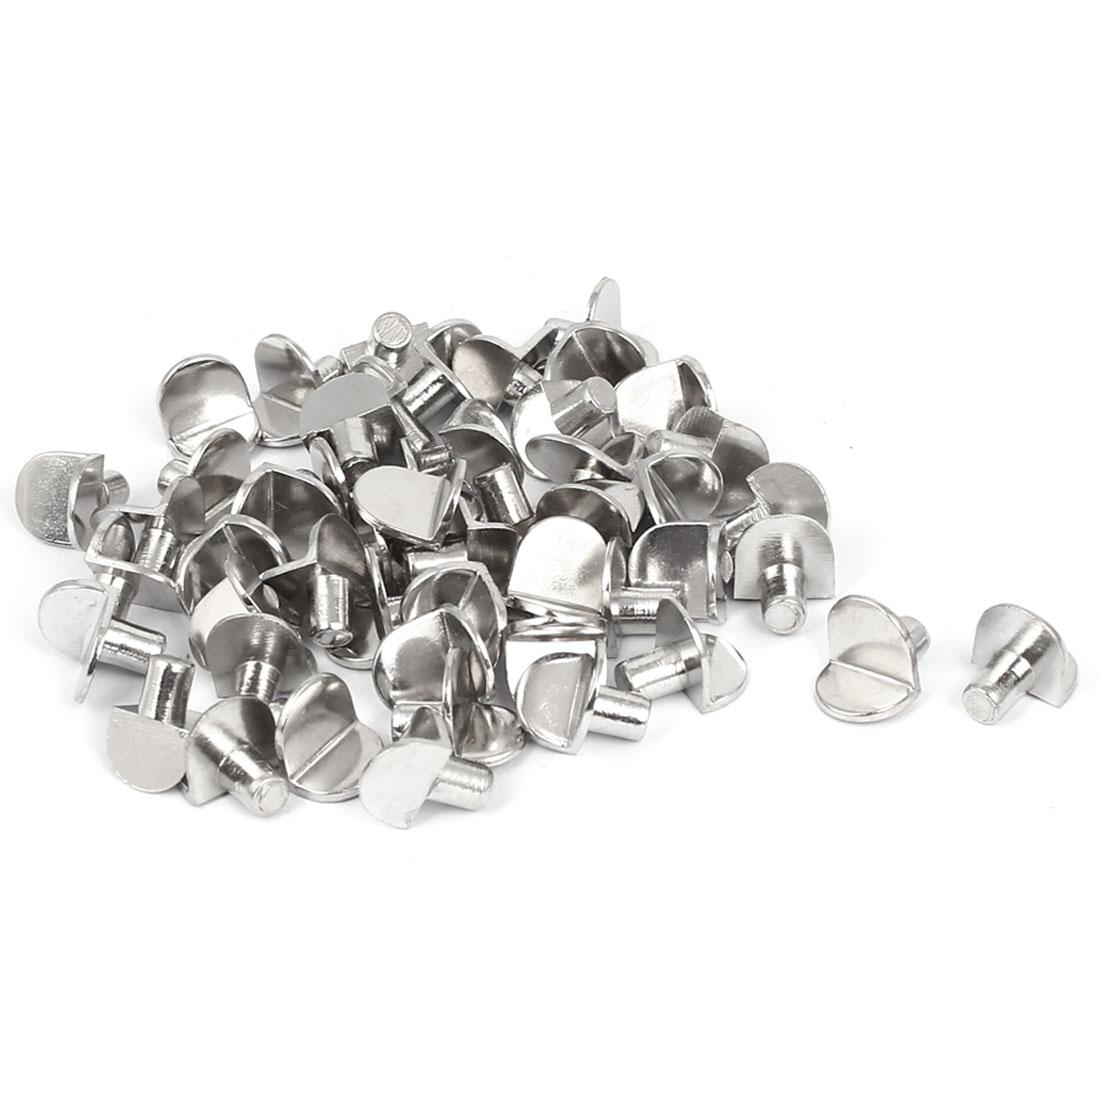 Cabinet Push-in Type 5mm Peg Alloy Shelf Support Bracket Silver Tone 50 Pcs